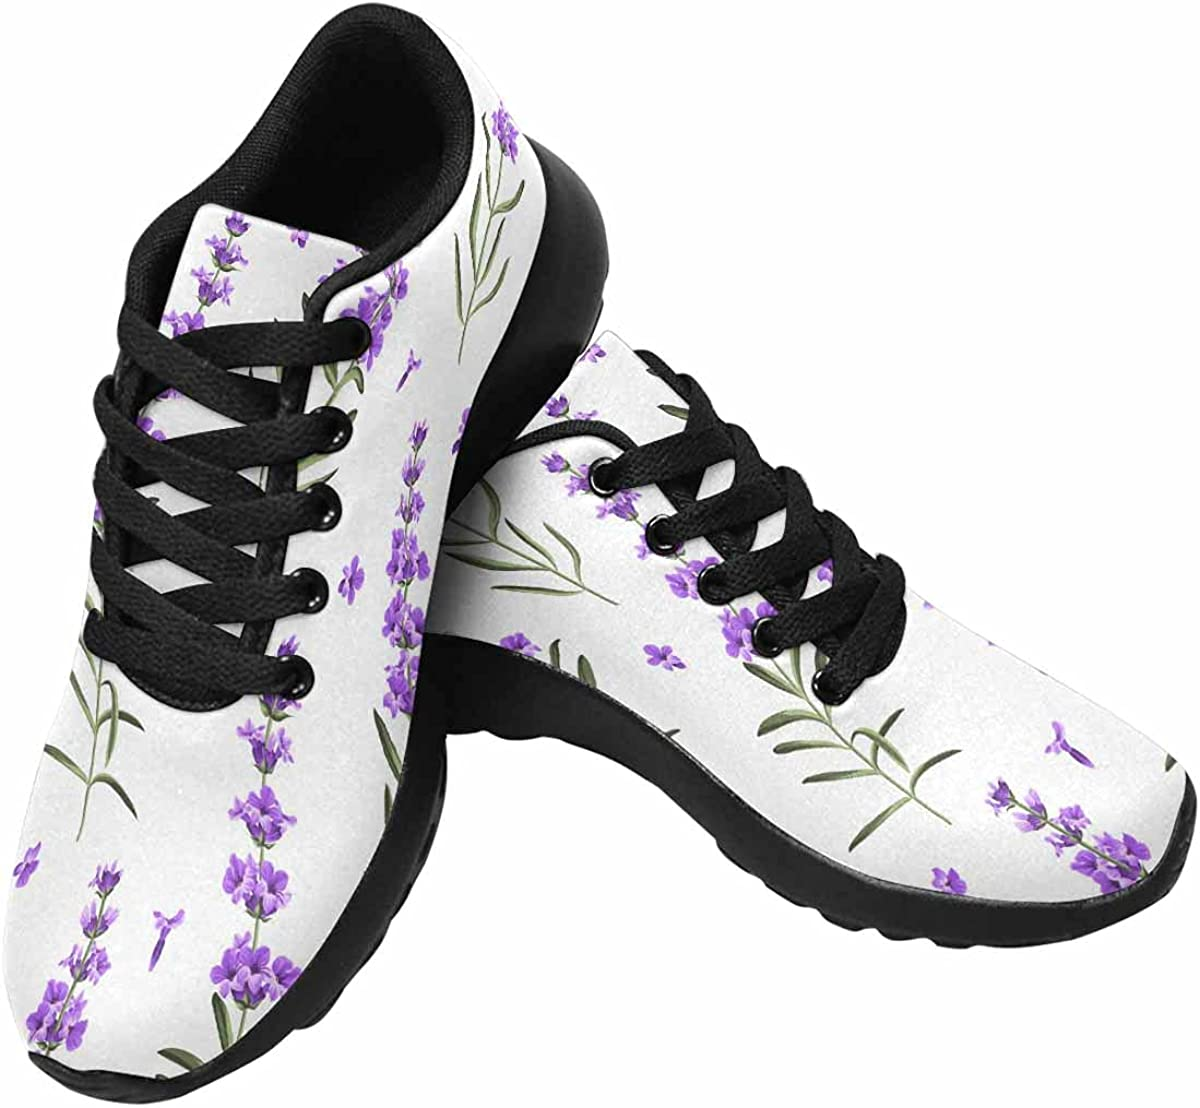 InterestPrint Running Shoes Women Walking Climbing Tennis Sneakers Lavender Flowers Green Sitripes